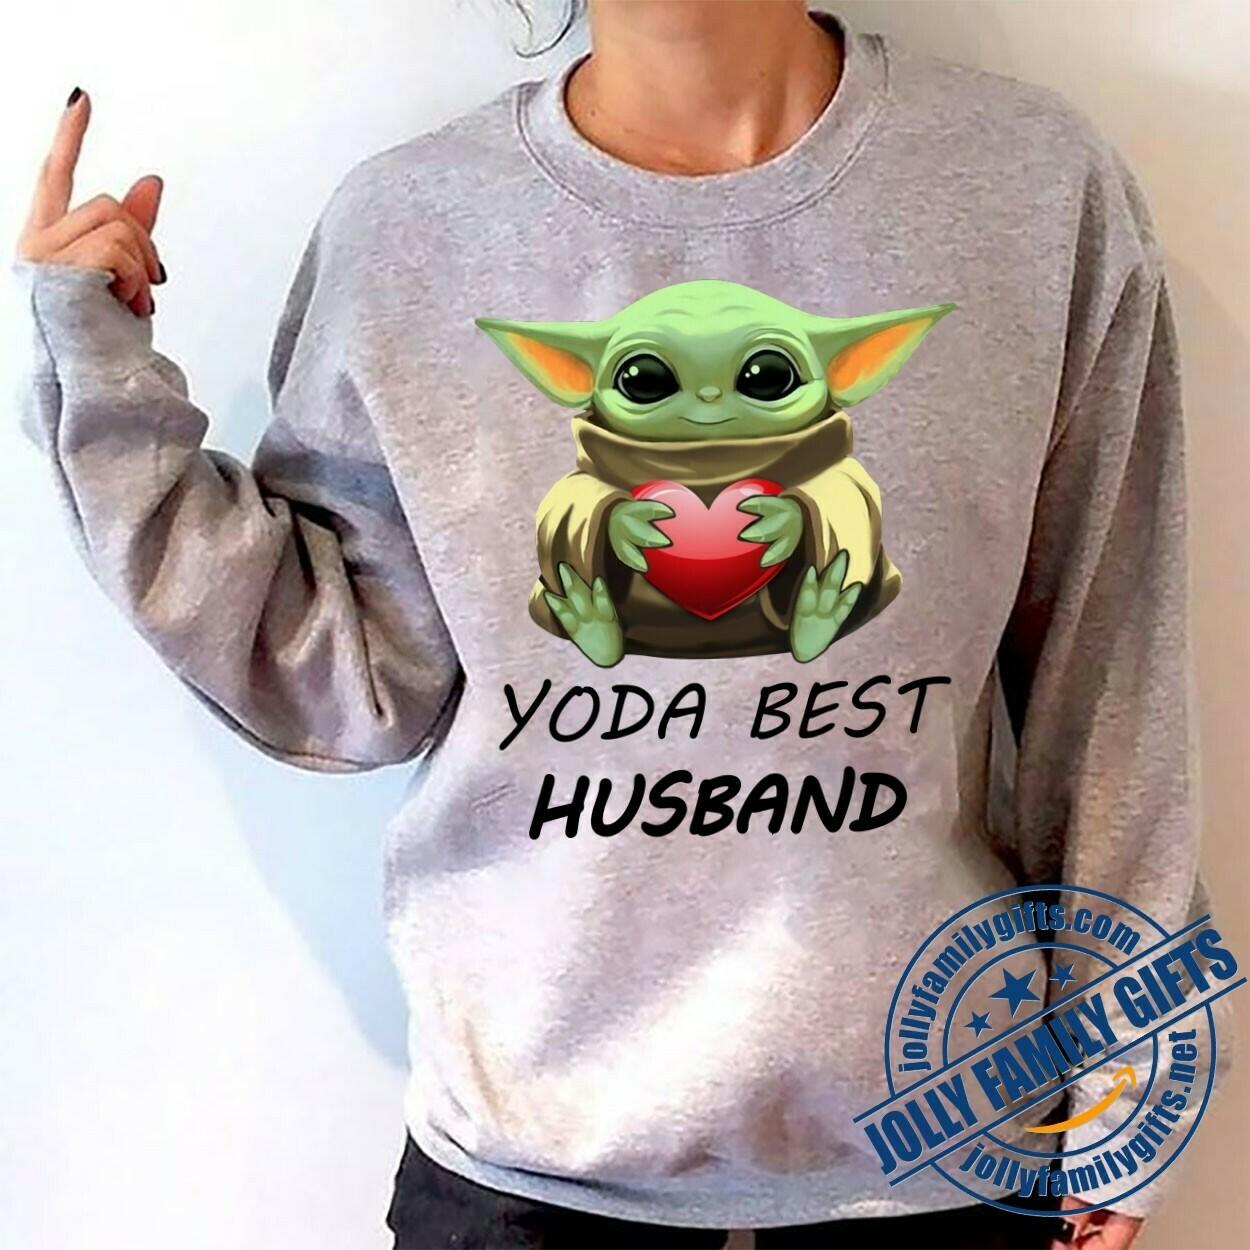 Baby Yoda The Mandalorian with death Star Wars Movie Yoda Best Husband,Yoda Hug Heart Valentines Gift for her him girlfriend Unisex T-Shirt Hoodie Sweatshirt Sweater for Ladies Women Men Kids Youth